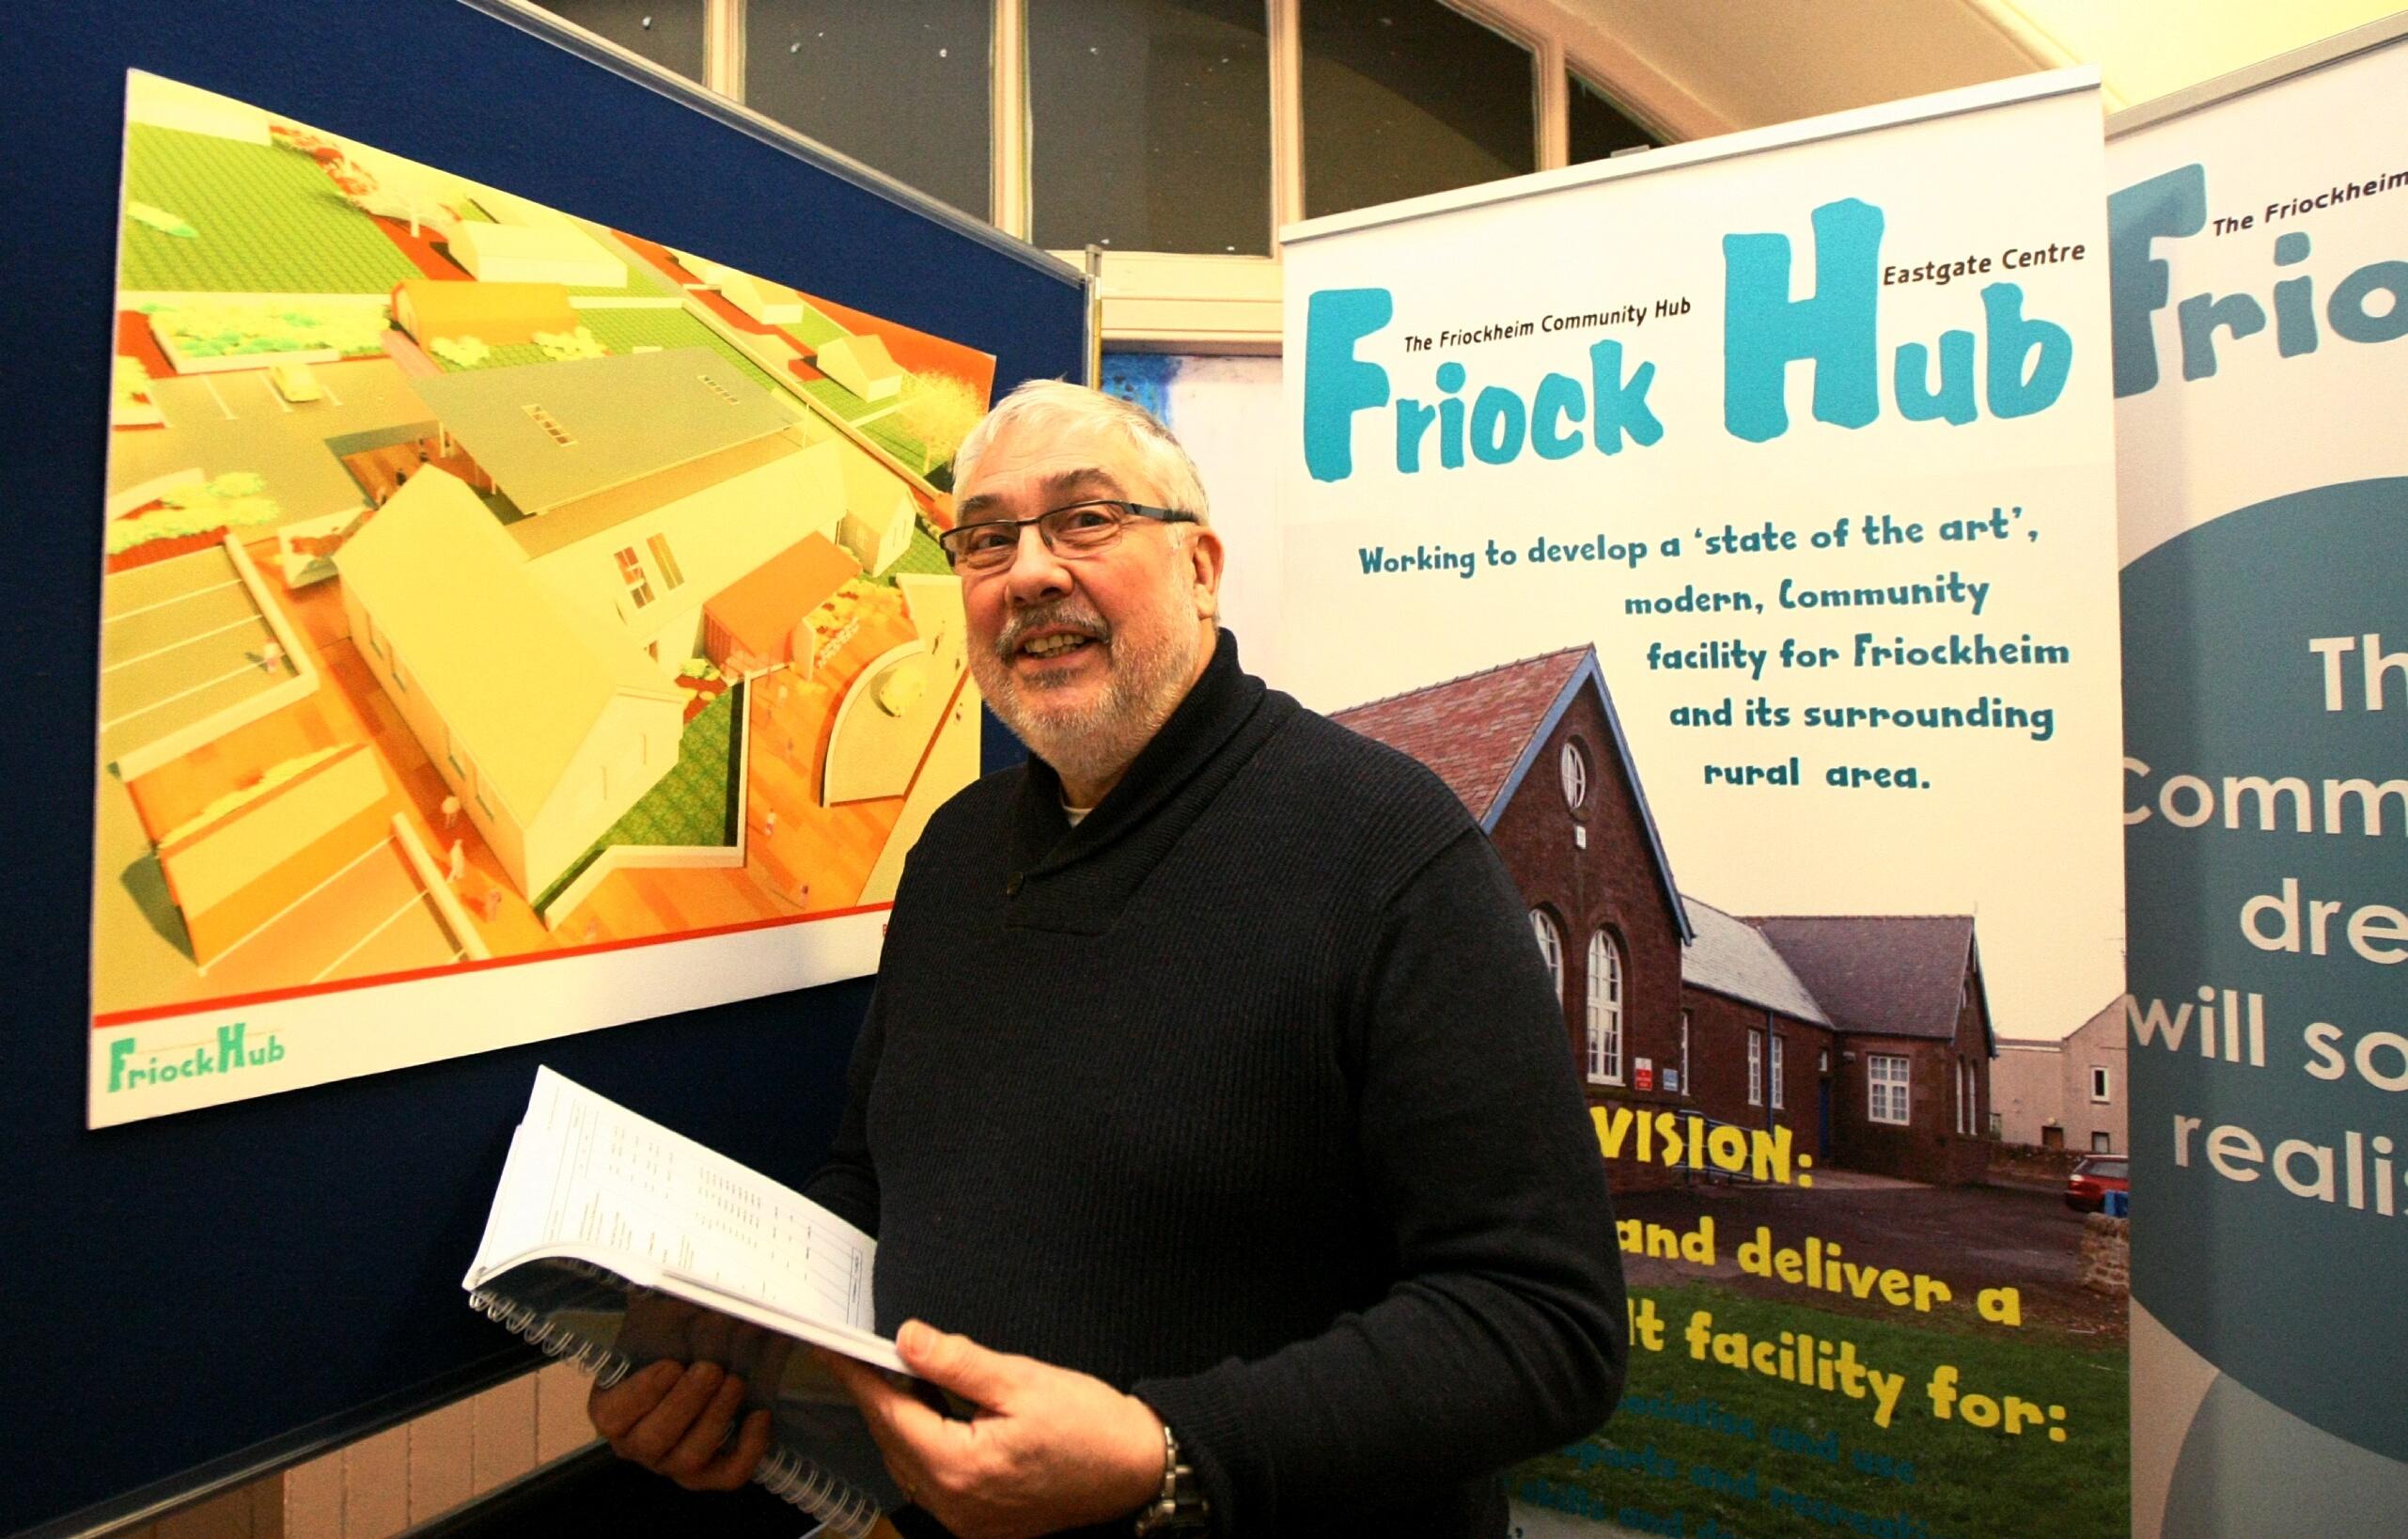 Pictured at the Friockheim Hub, Dougie Pond - Chairman of the Friockheim Community Hub